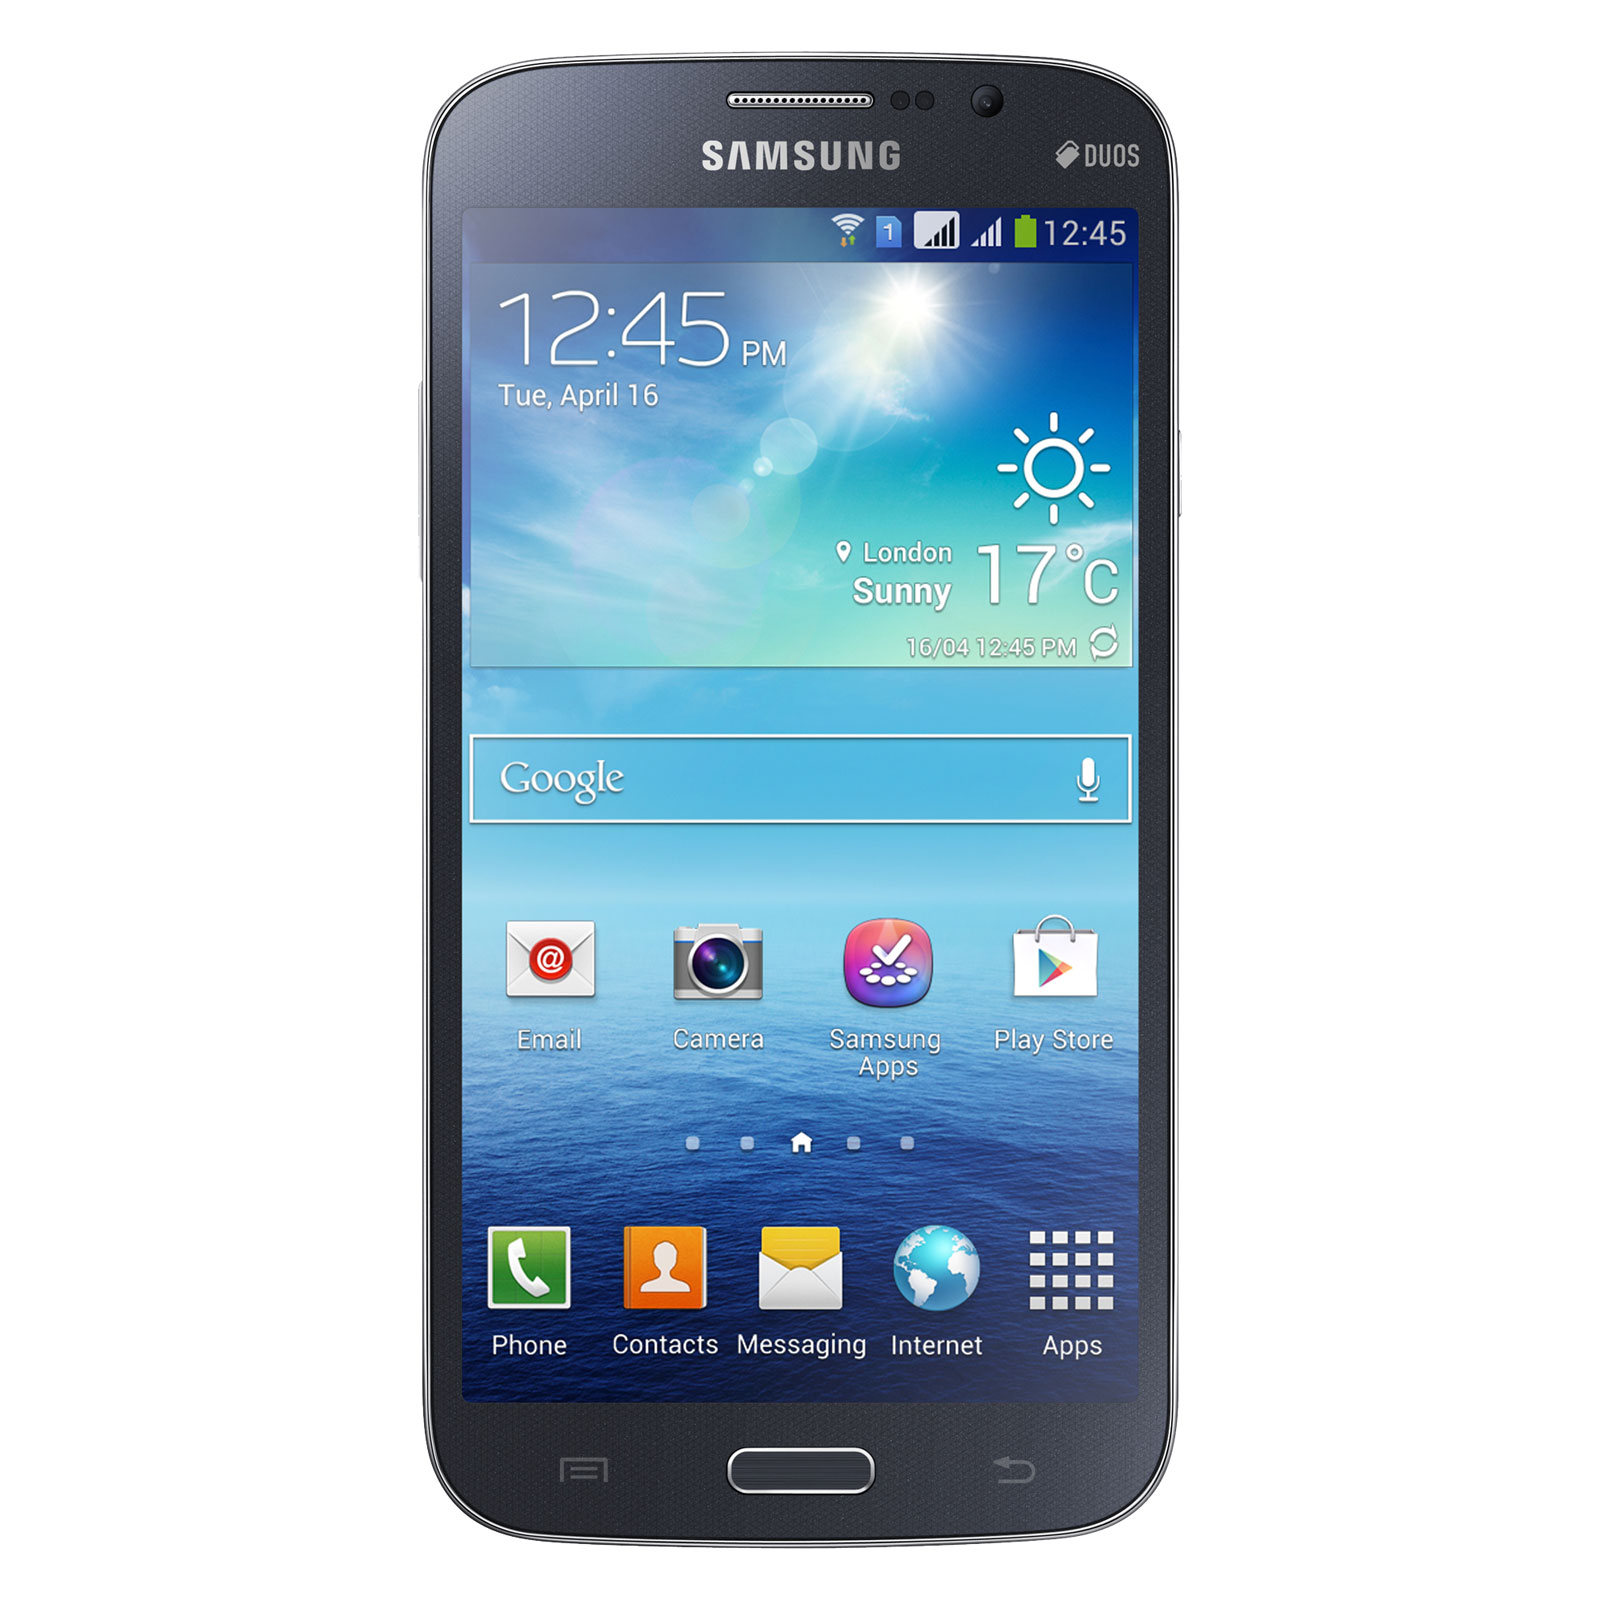 samsung galaxy mega duos gt i9152 noir mobile smartphone samsung sur ldlc. Black Bedroom Furniture Sets. Home Design Ideas